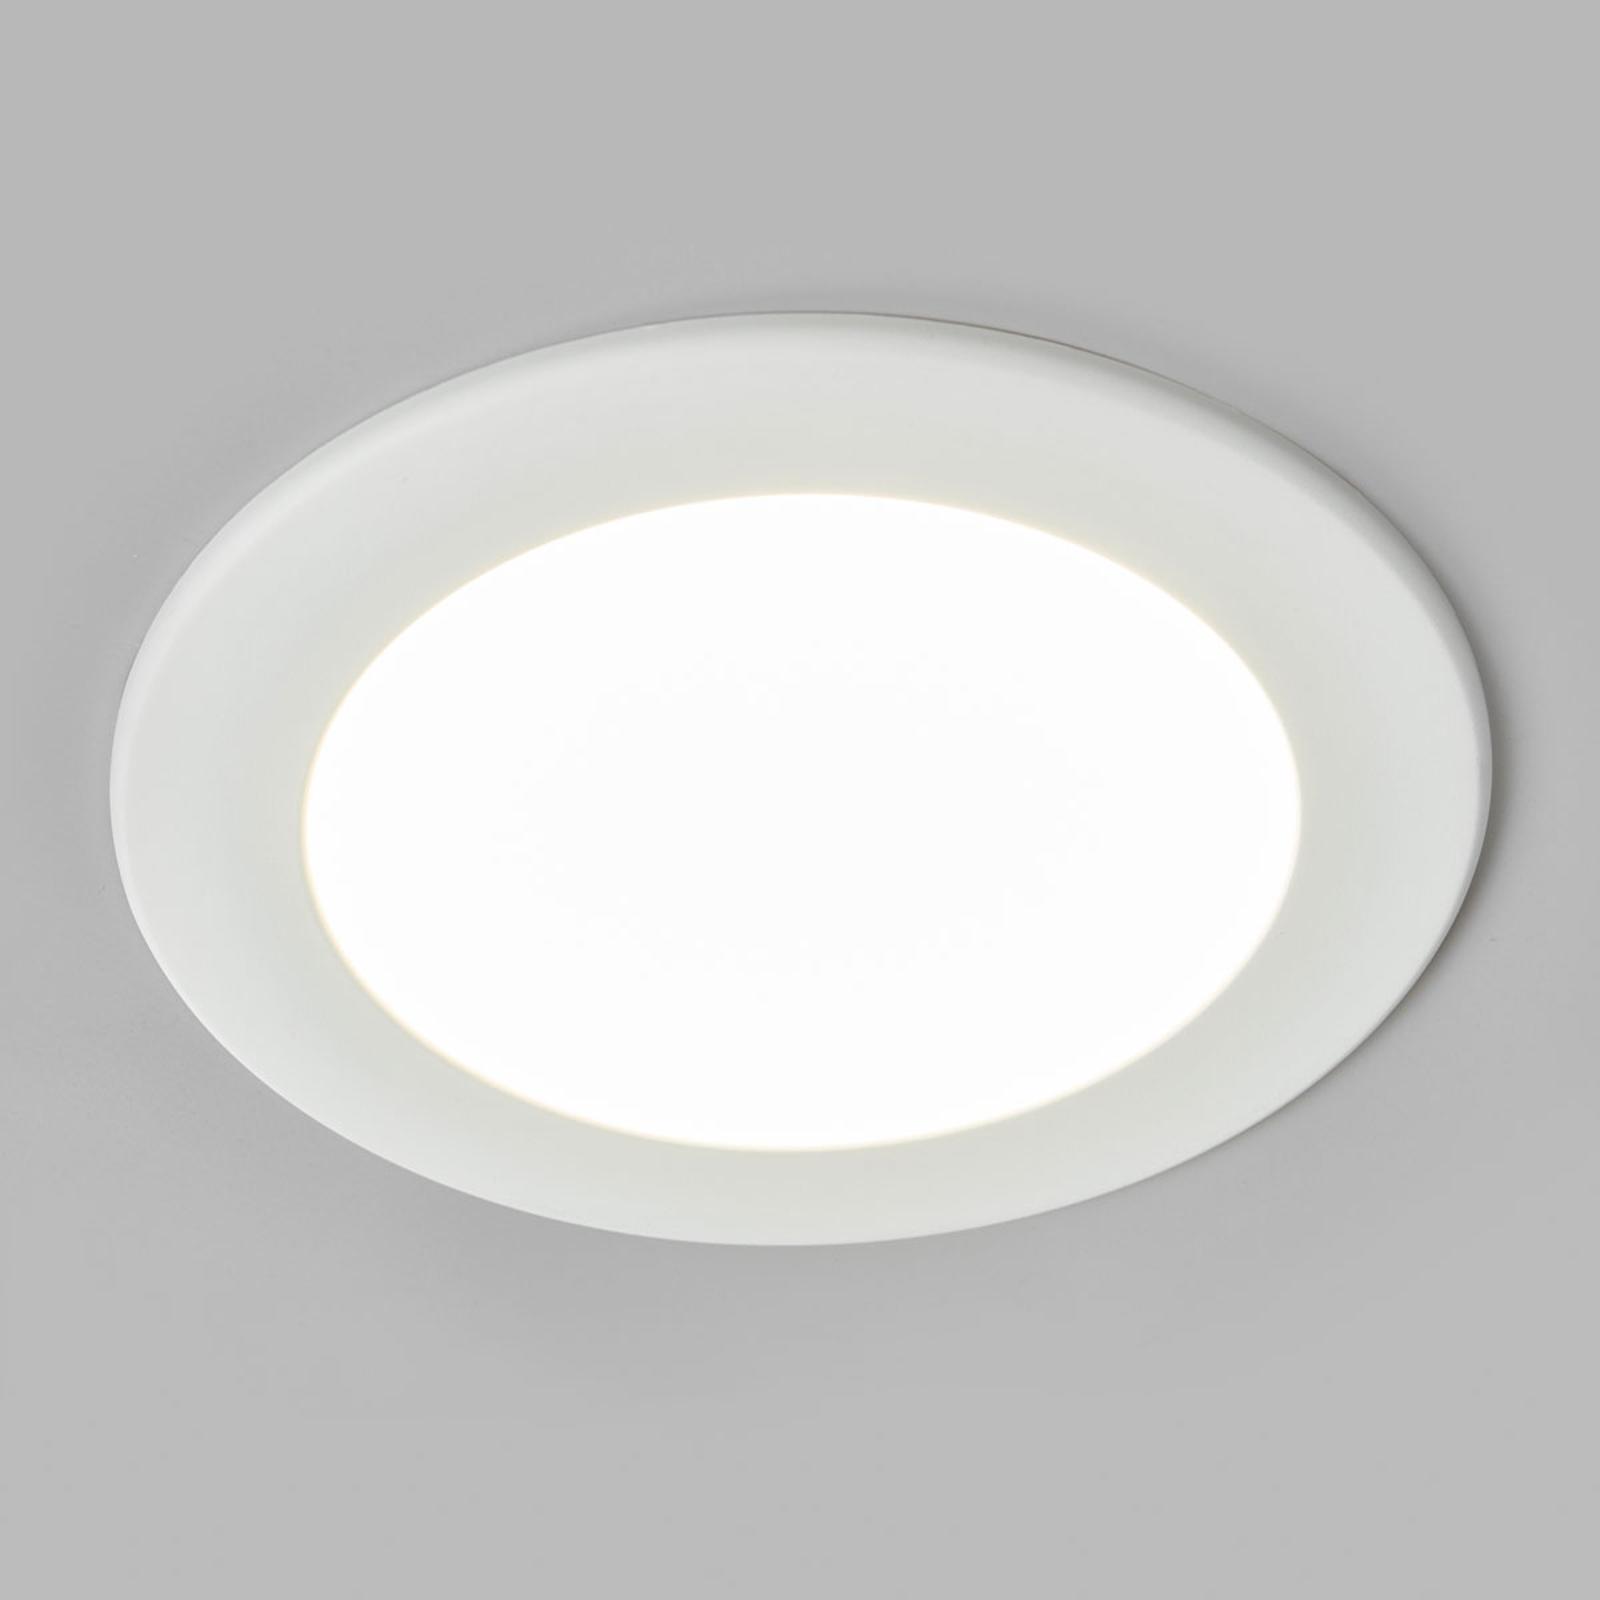 Spot encastré LED Joki blanc 4000K rond 17cm